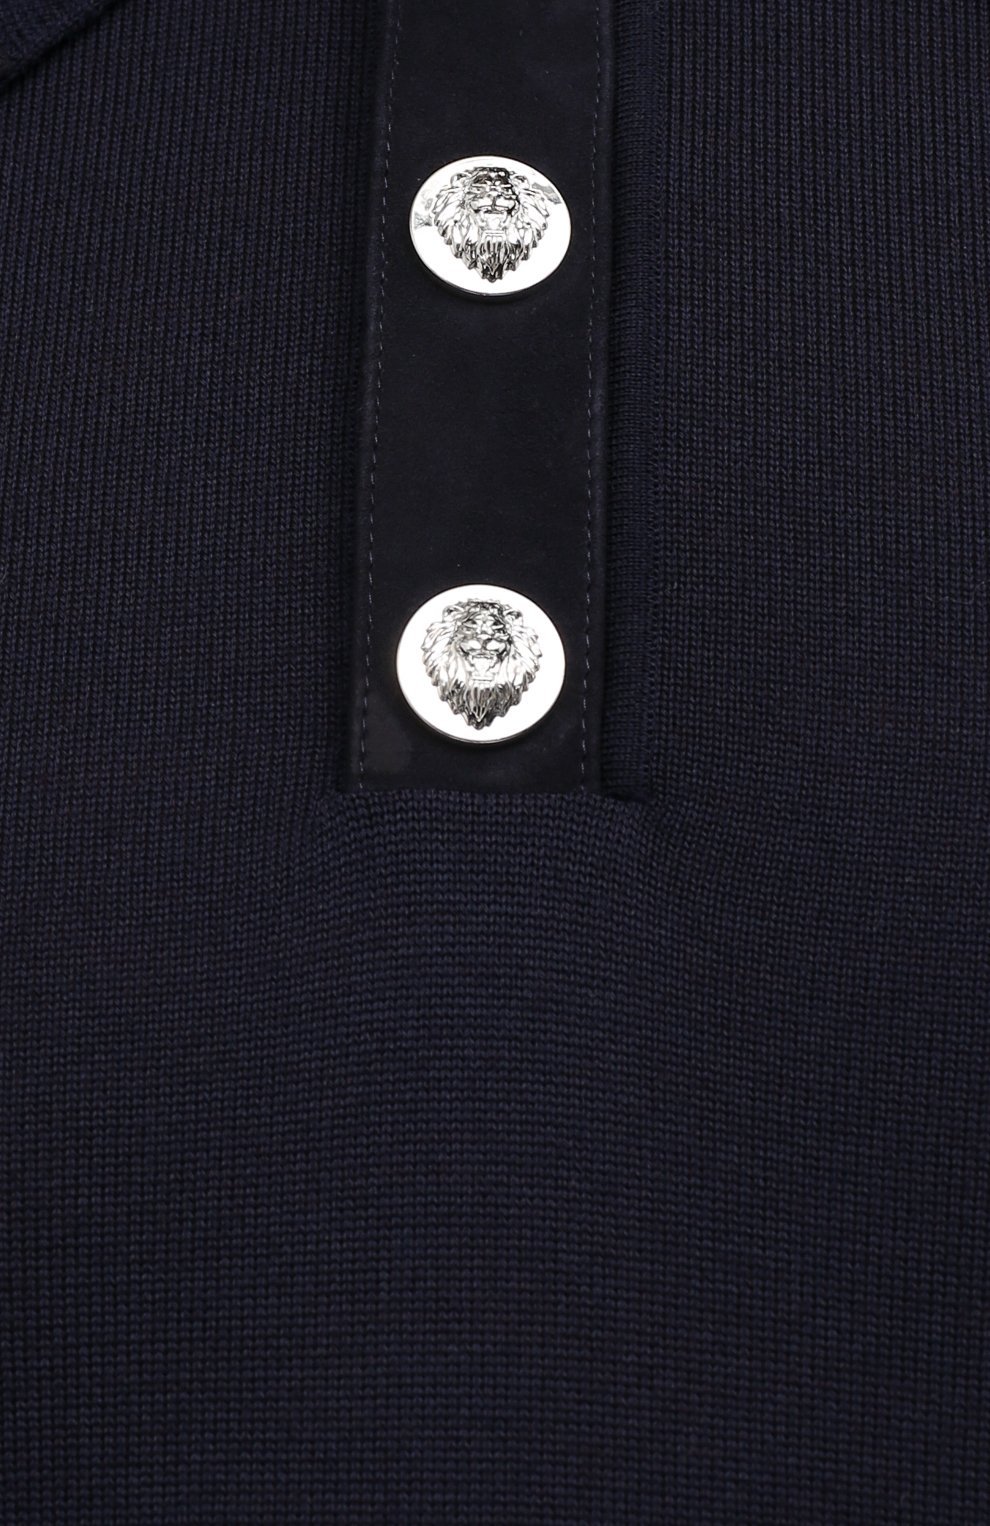 Мужское шерстяное поло BILLIONAIRE темно-синего цвета, арт. W20C MKK0166 BCO025N | Фото 5